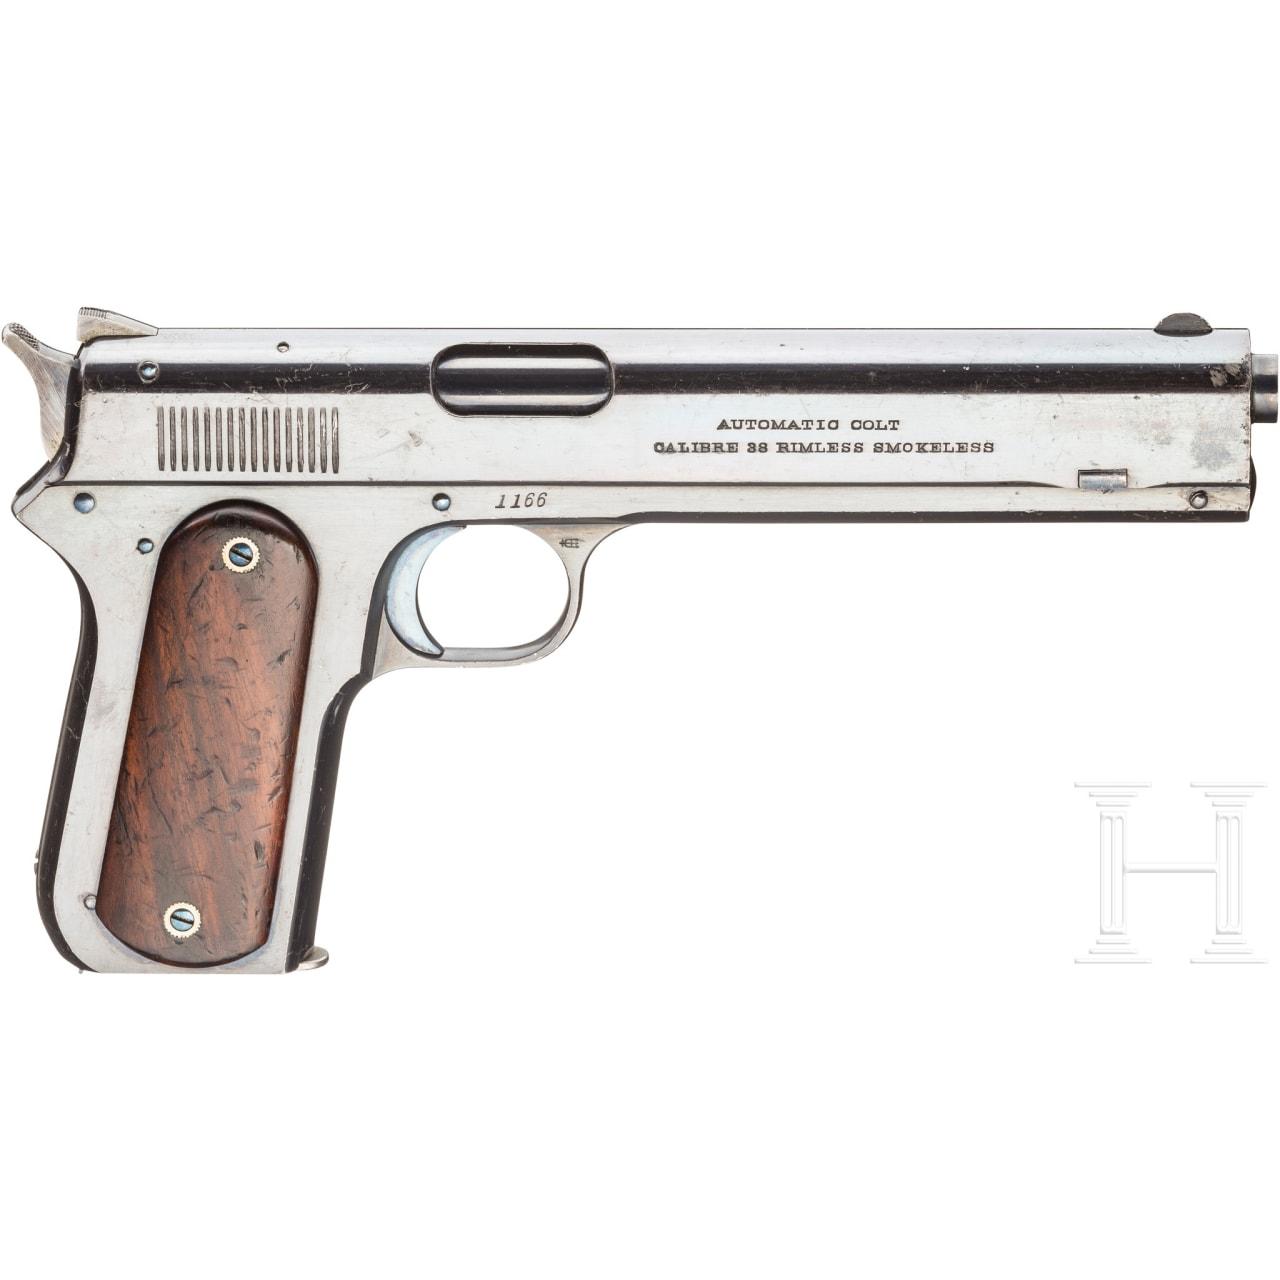 Colt Mod. 1900 Automatic Pistole, Navy-Contract, 1. Waffe eines Pärchens